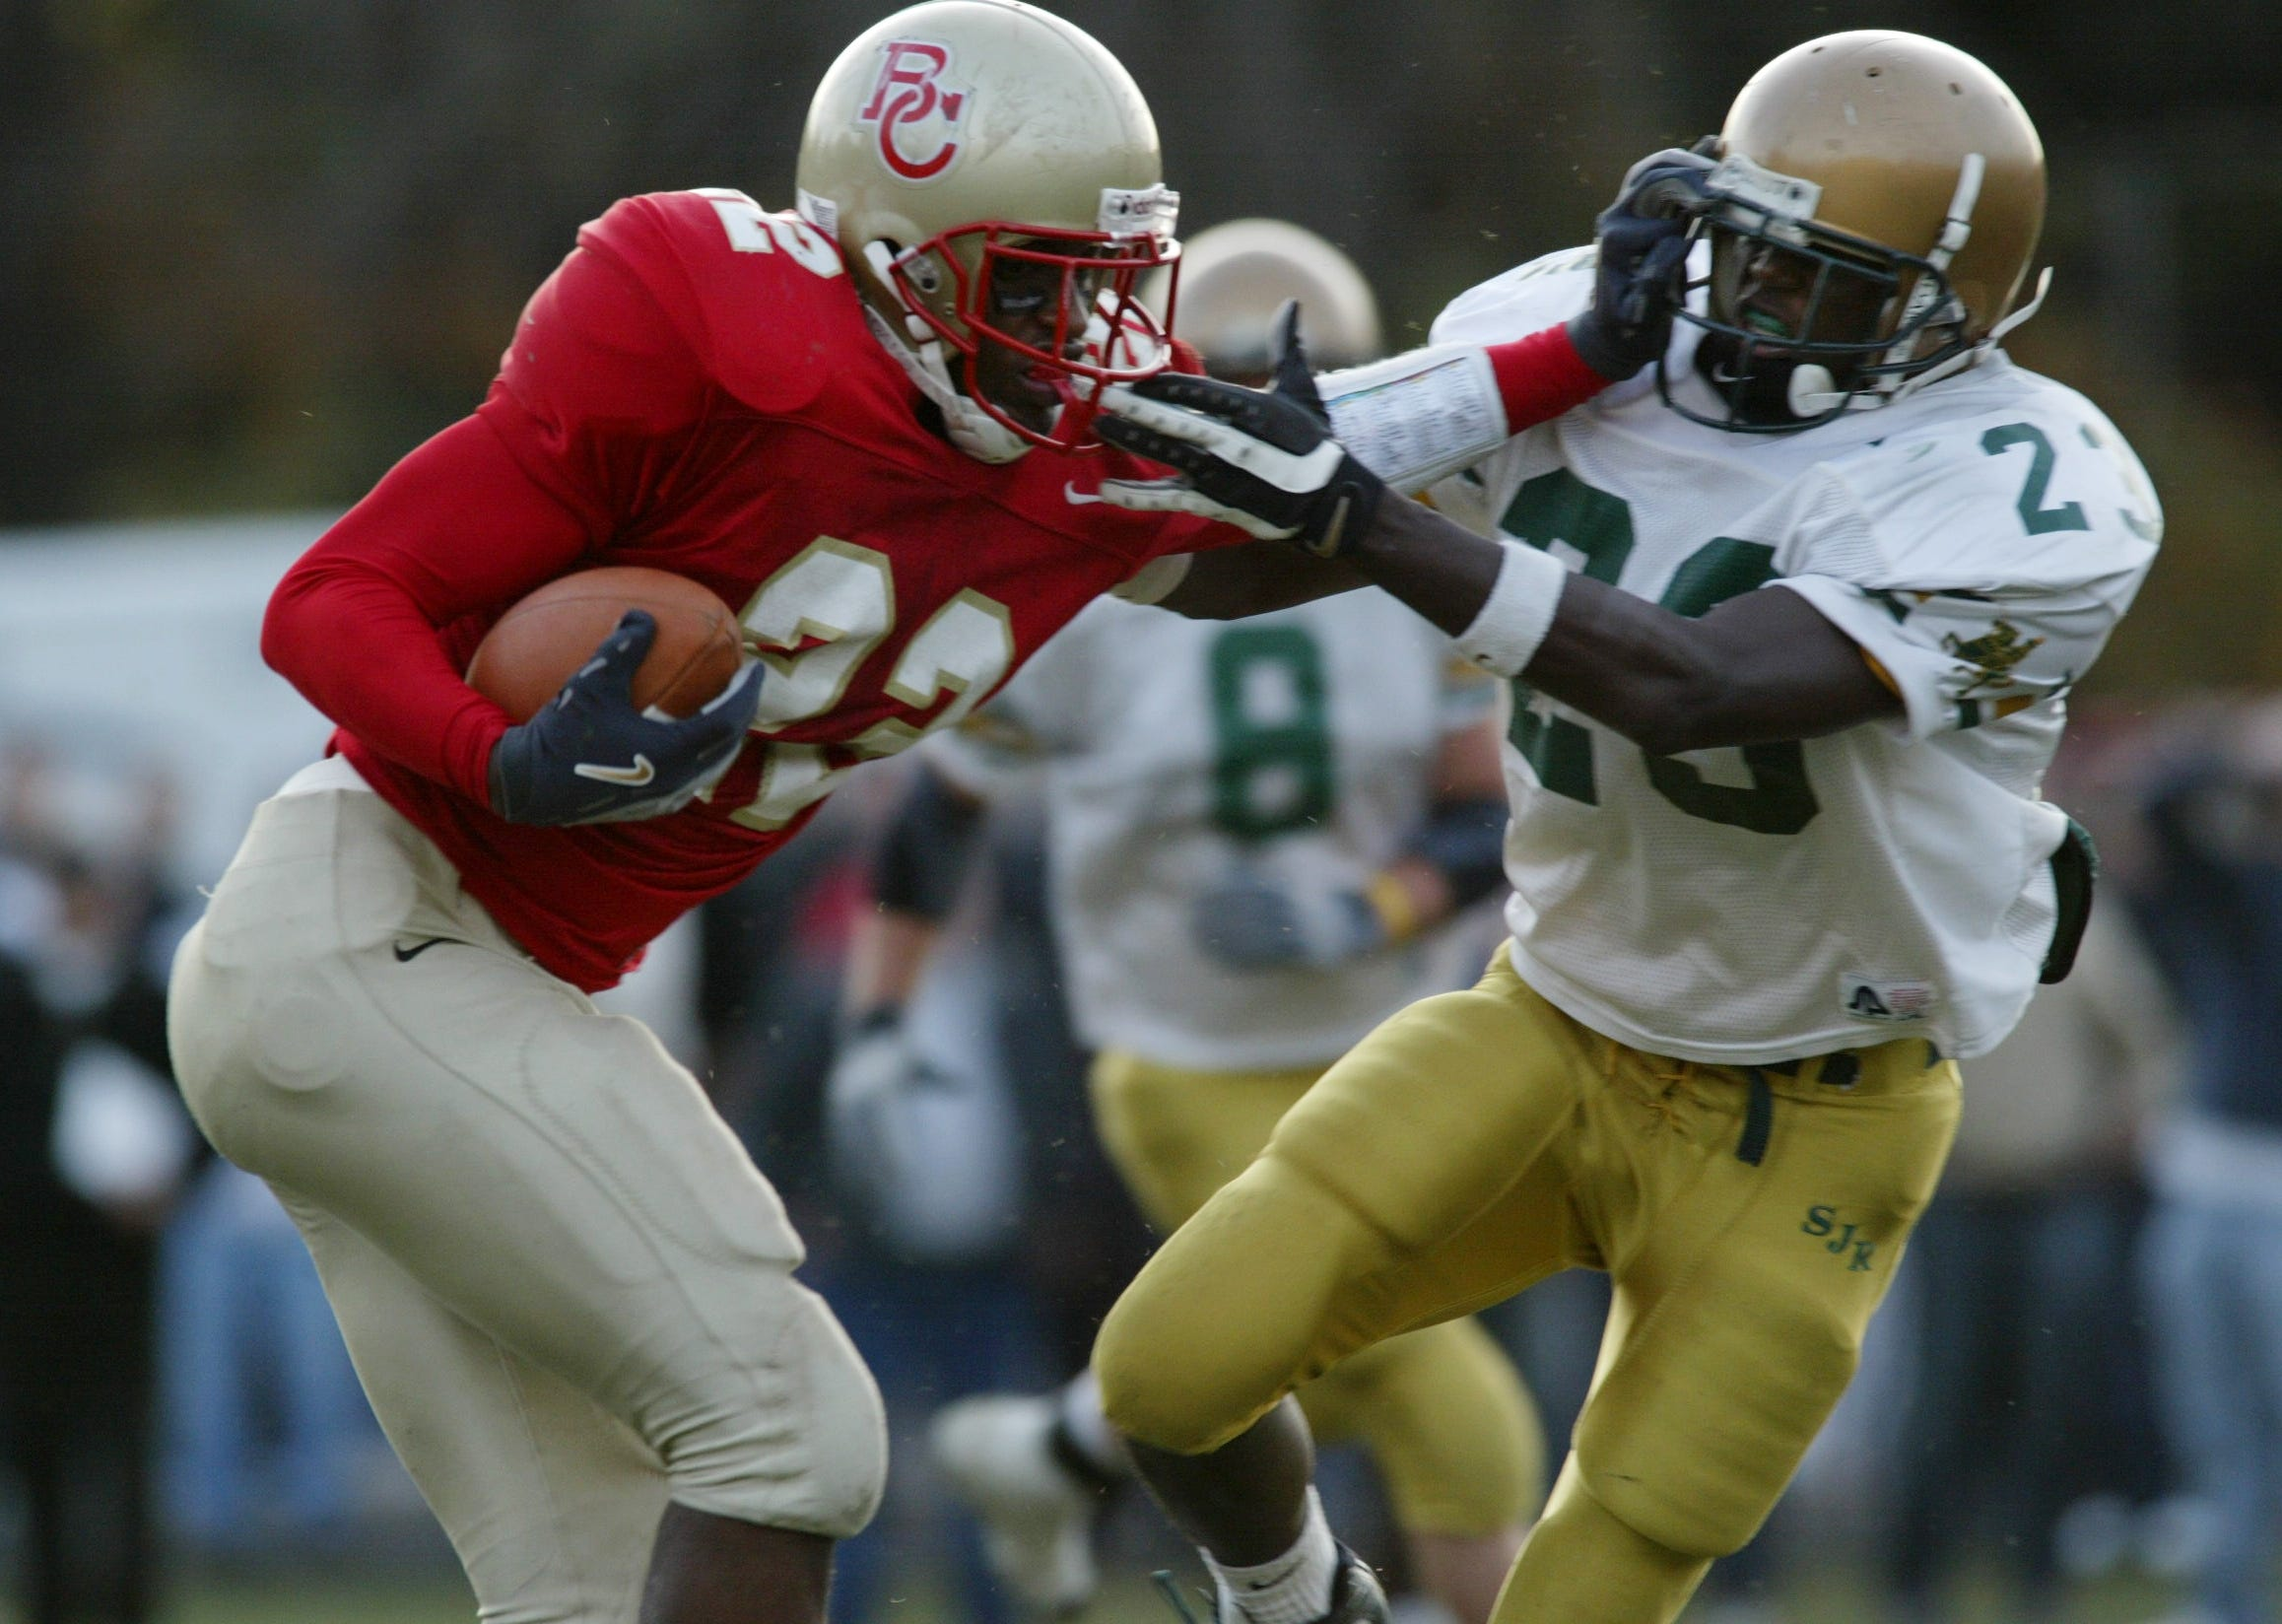 Bergen Catholic-St. Joseph football: North Jersey`s original rivalry